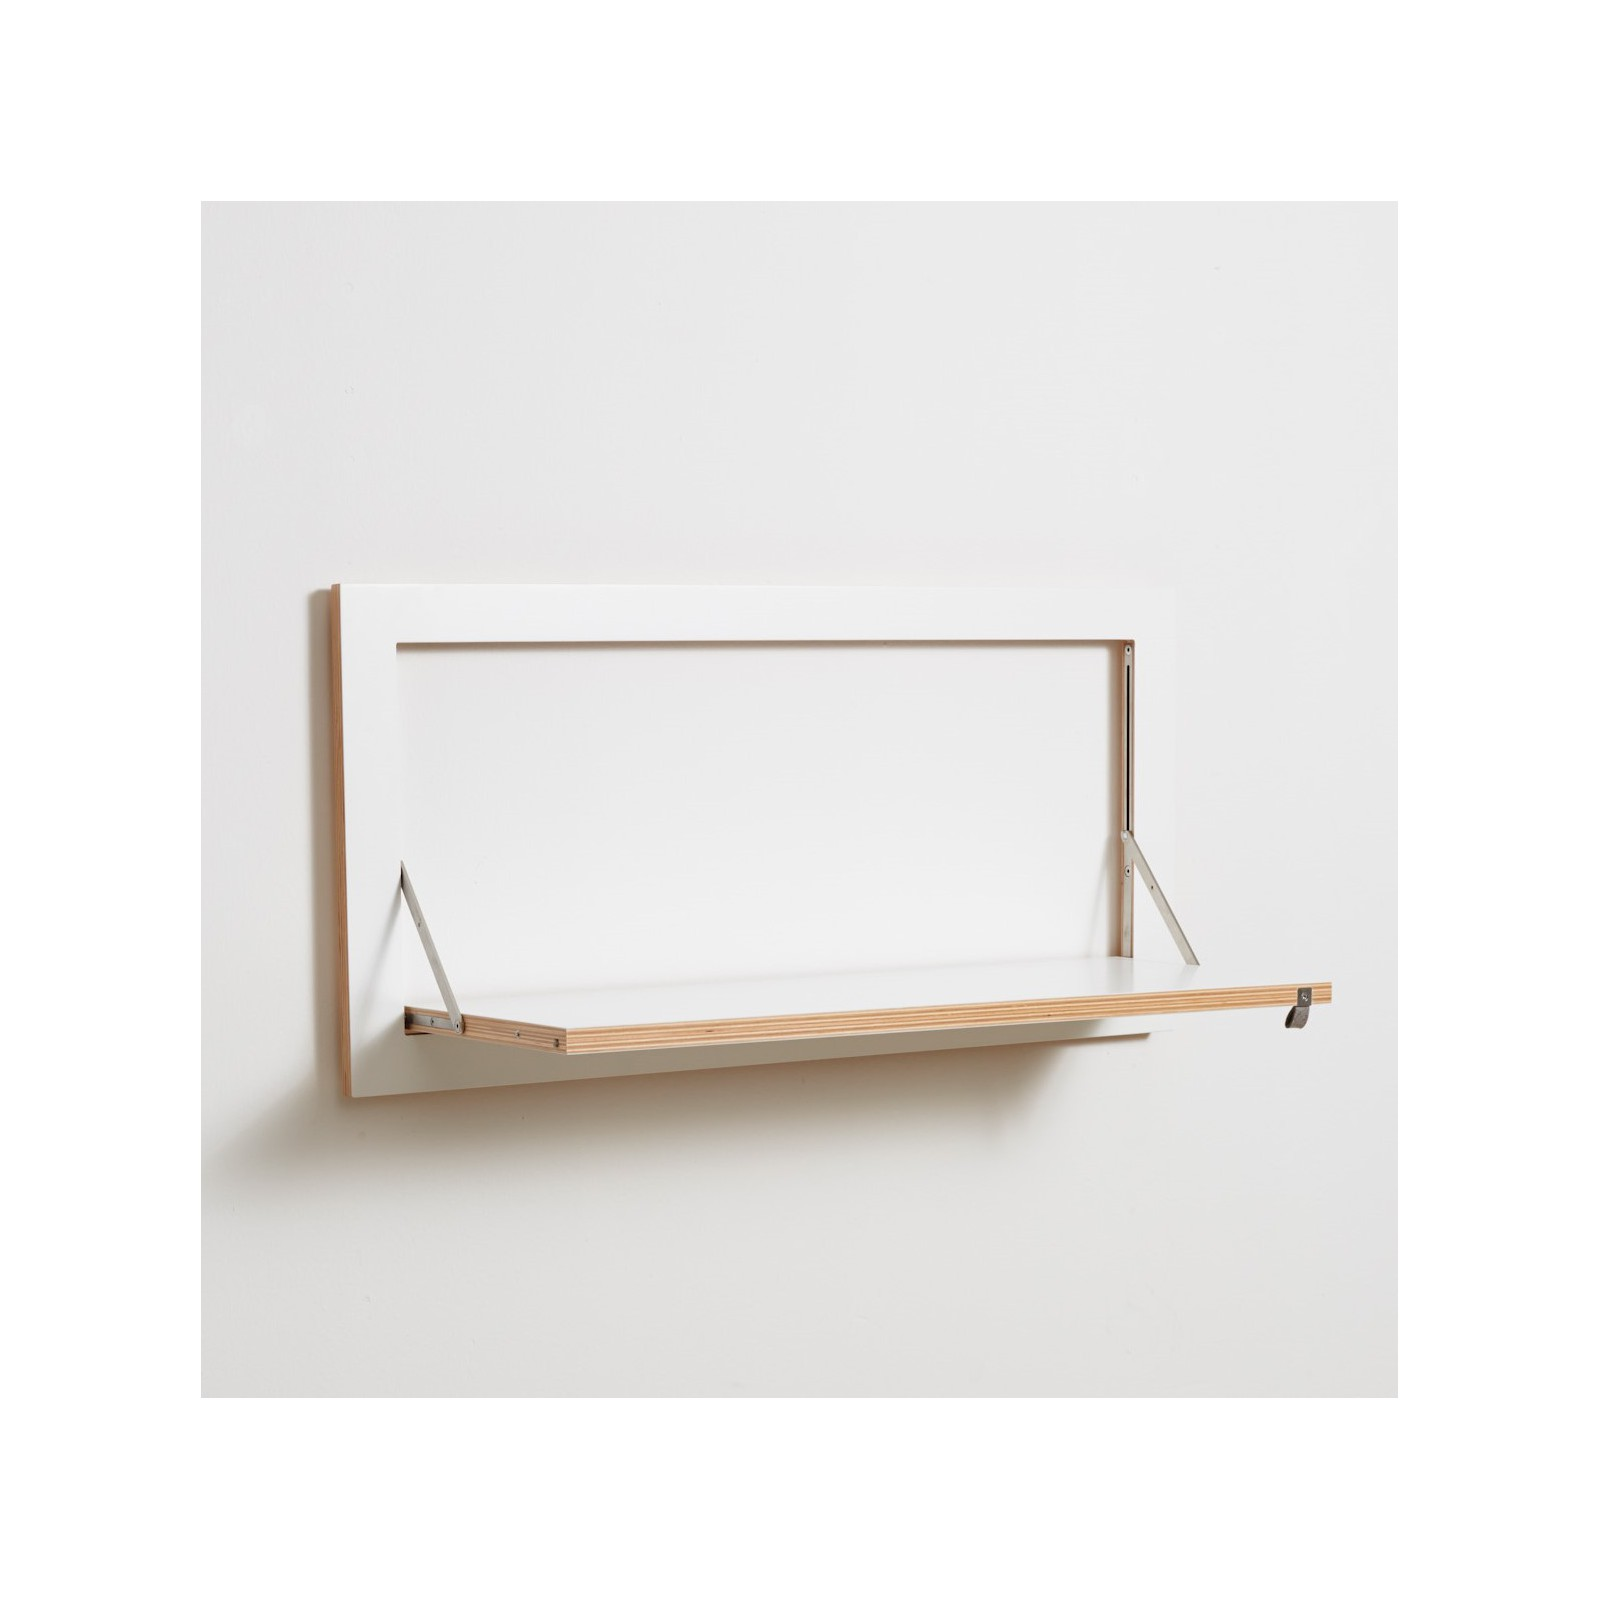 Medium Feuille Etagère Blanche Arne Concept nwOyPvN08m